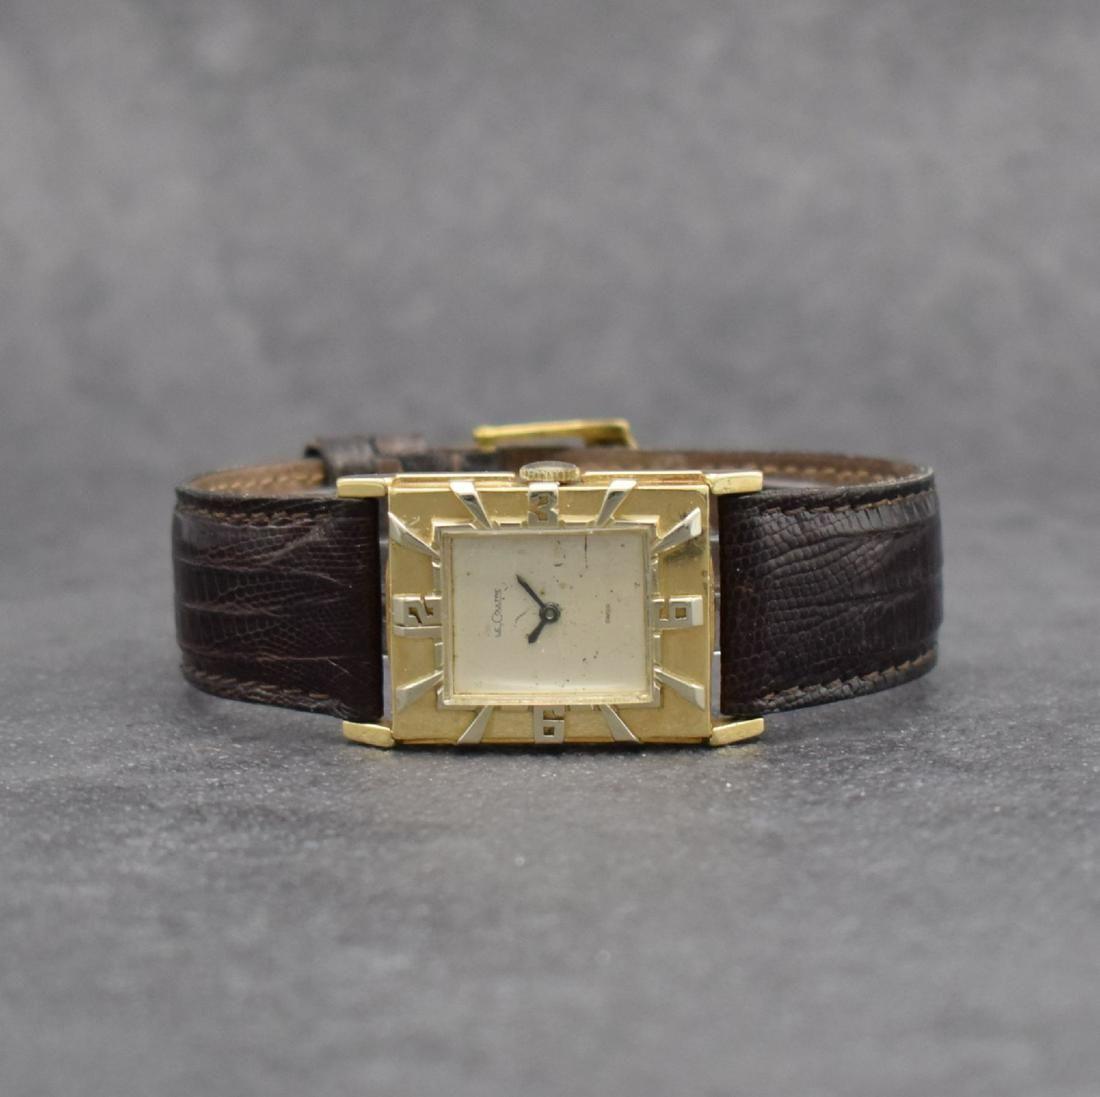 LeCoultre rare 14k yellow gold gents wristwatch